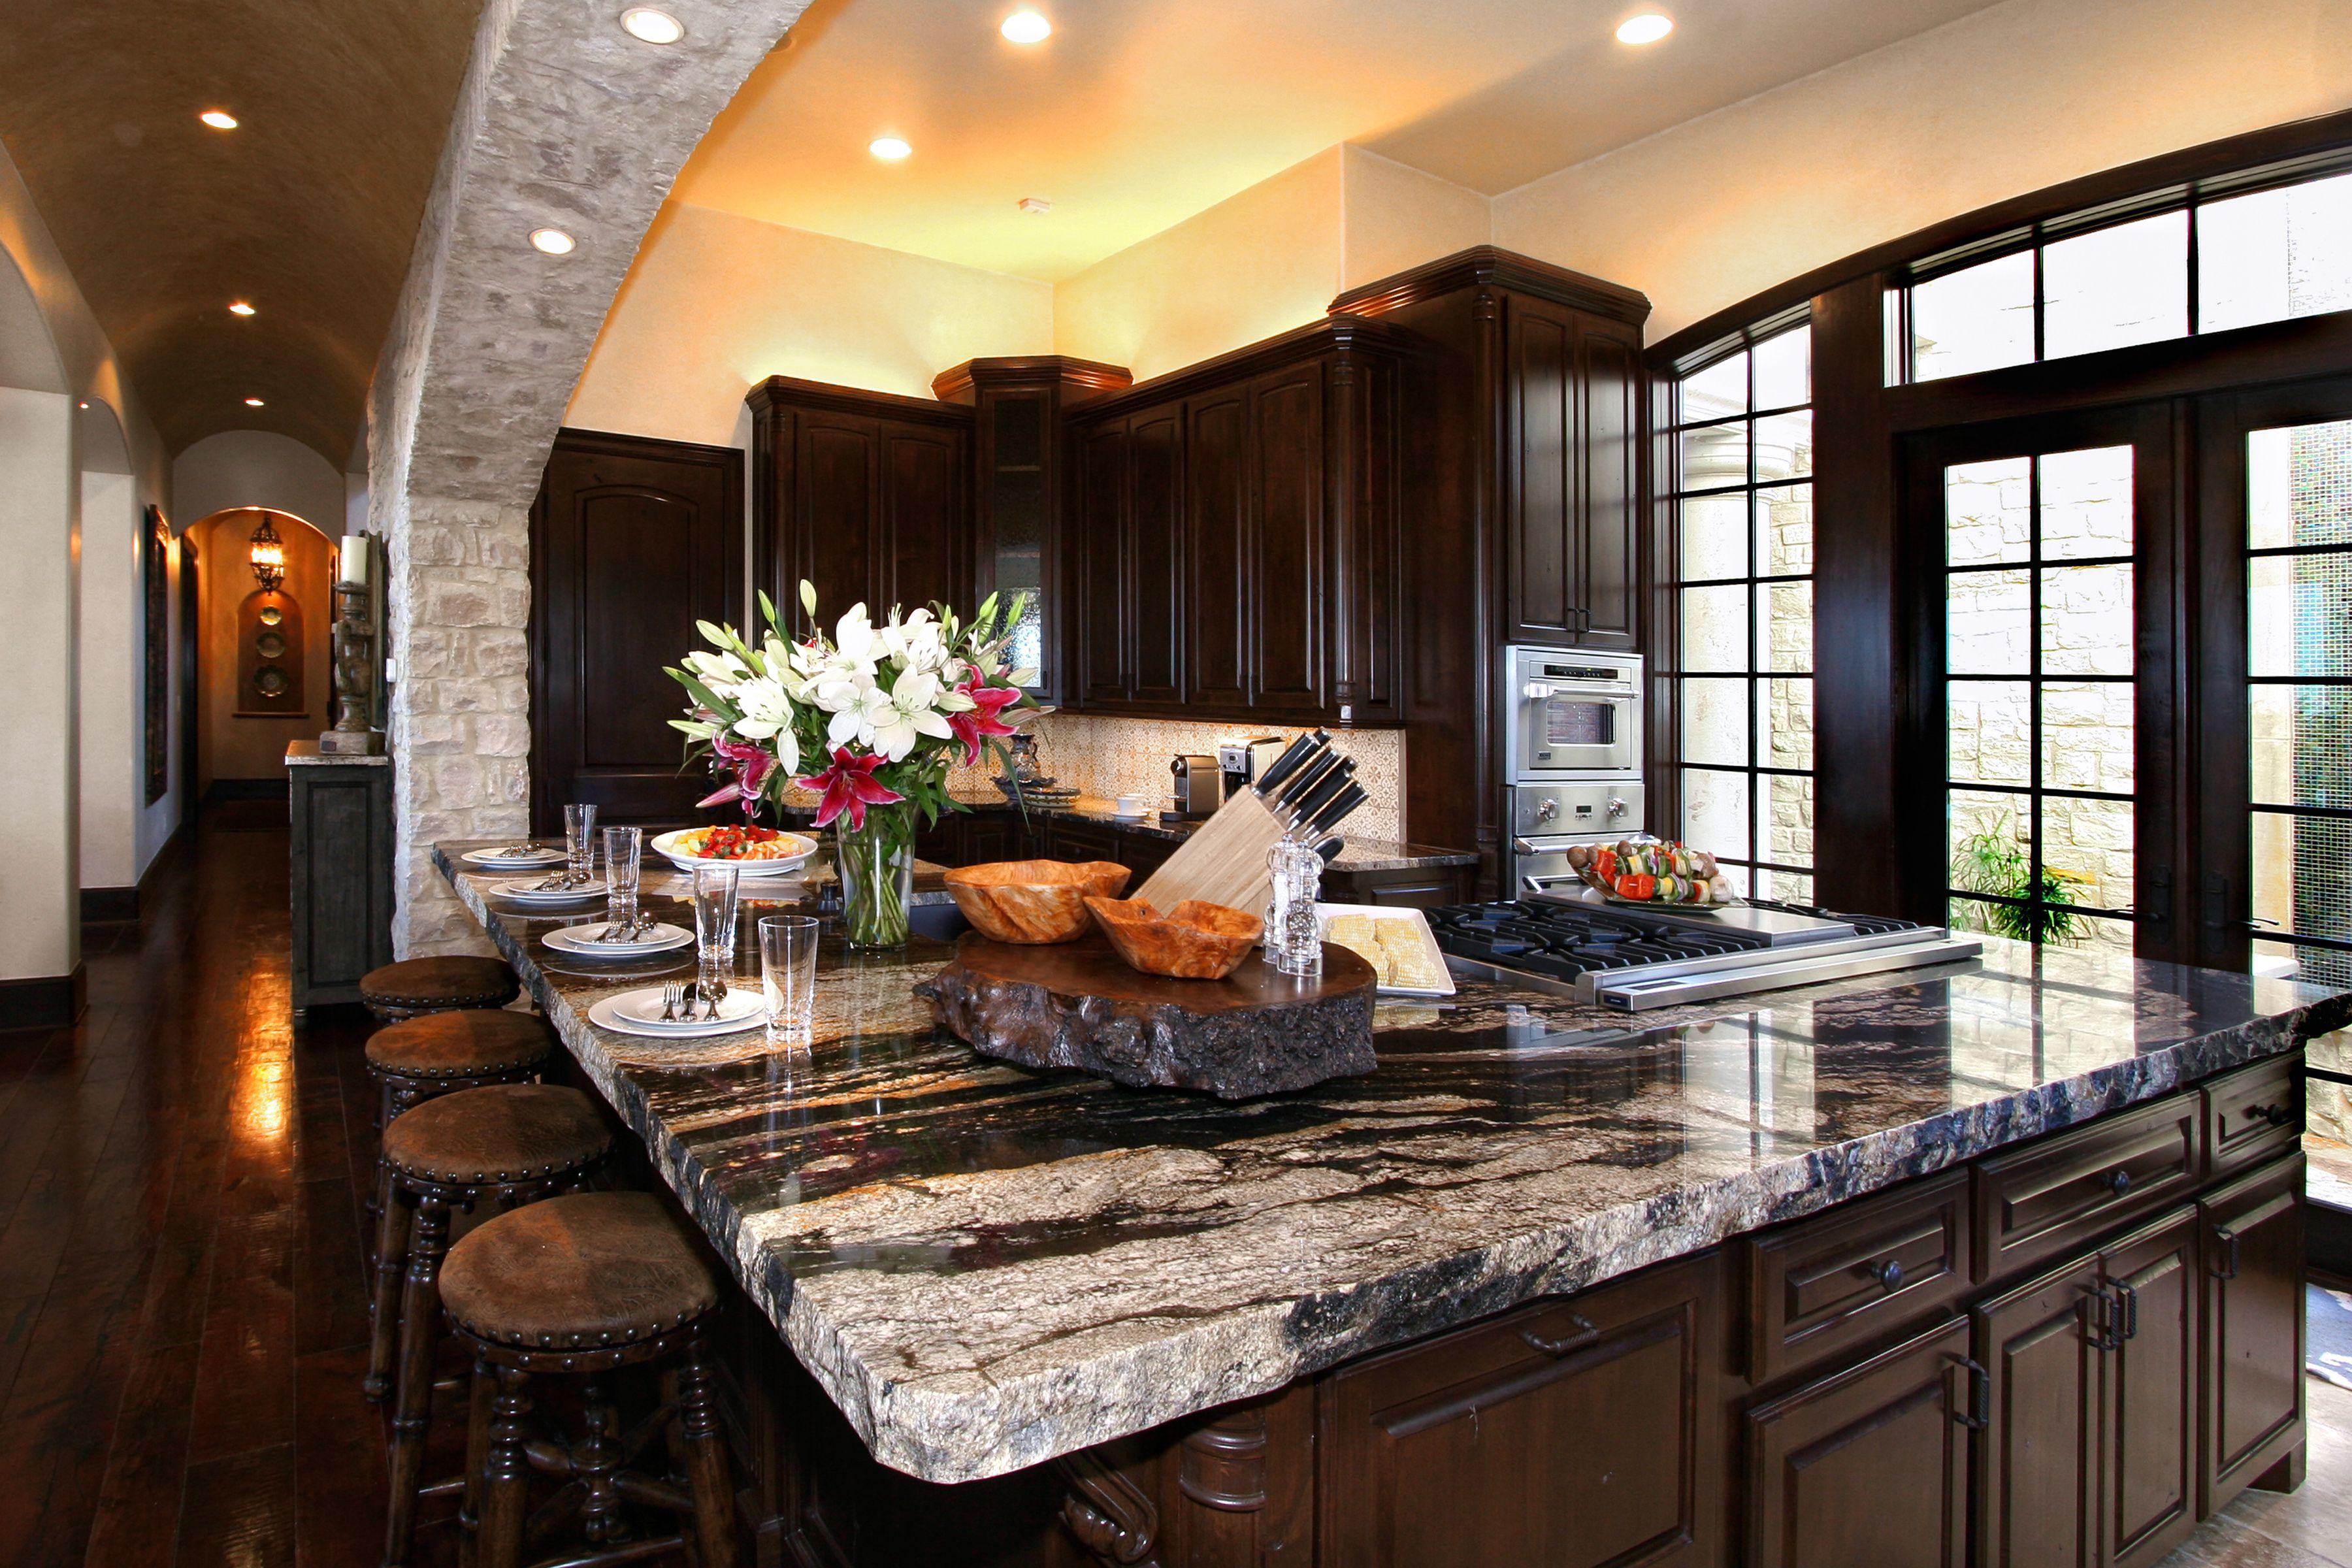 Horseshoe bay kitchen breakfast bar seating by zbranek holt custom homes austin horseshoe bay luxury custom home builder